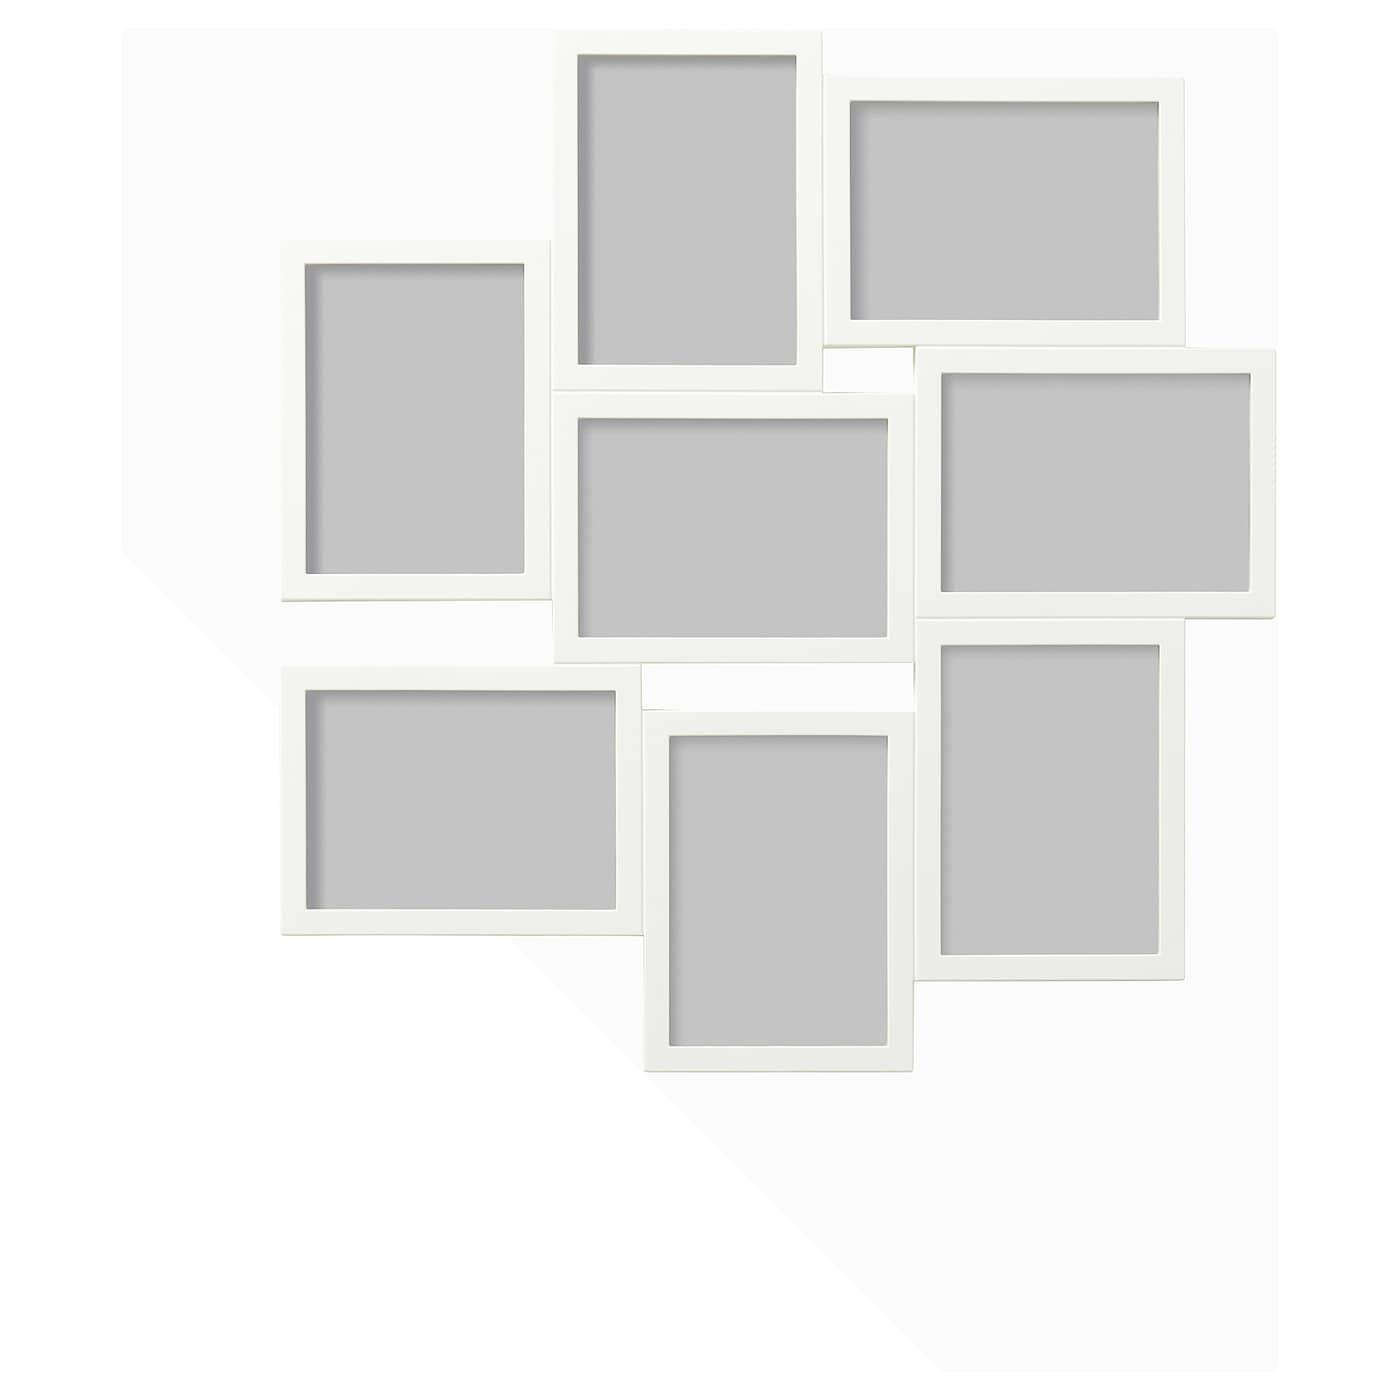 V xbo marco 8 fotos blanco 13 x 18 cm ikea - Ikea marco fotos ...